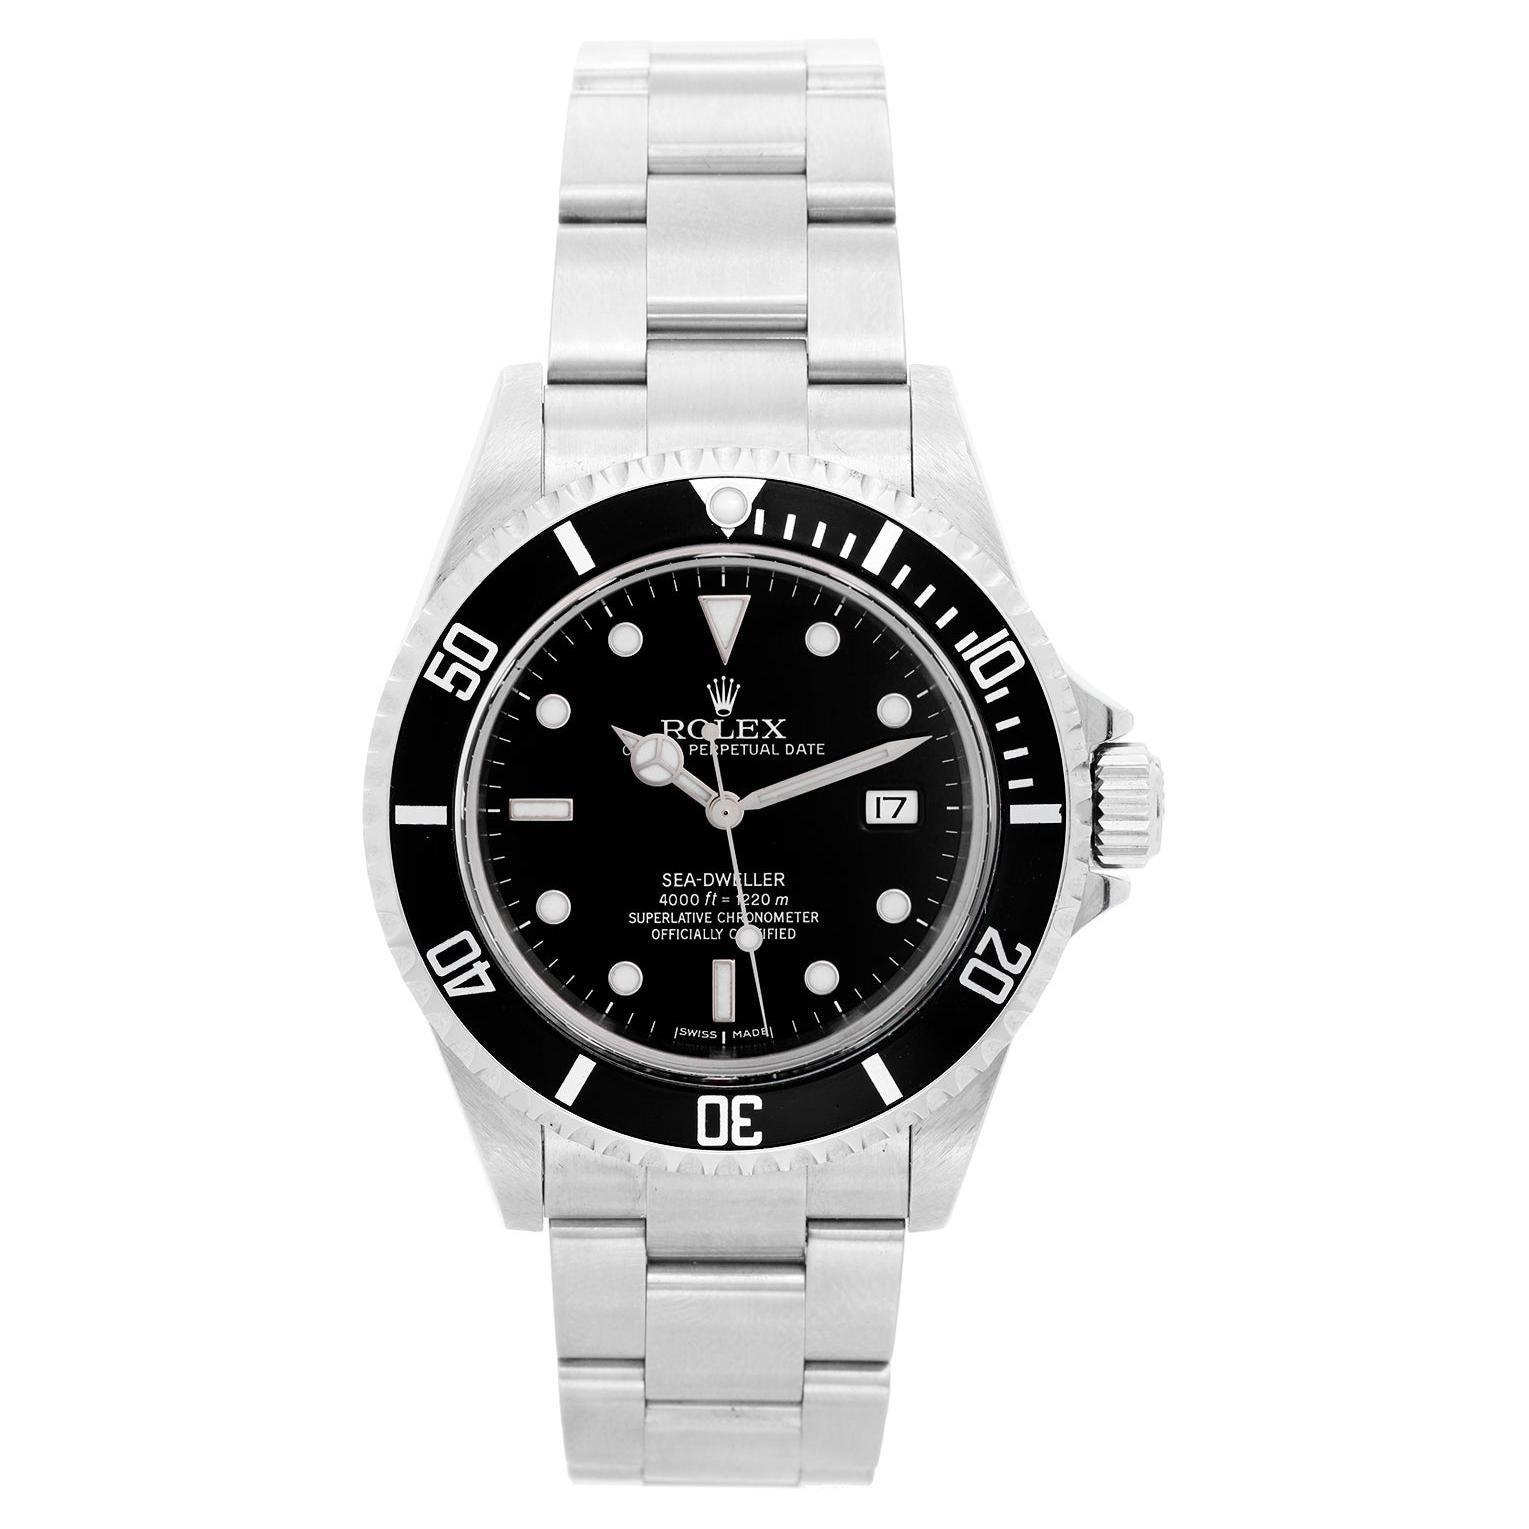 Rolex Sea Dweller Stainless Steel Men's Divers Watch 16600